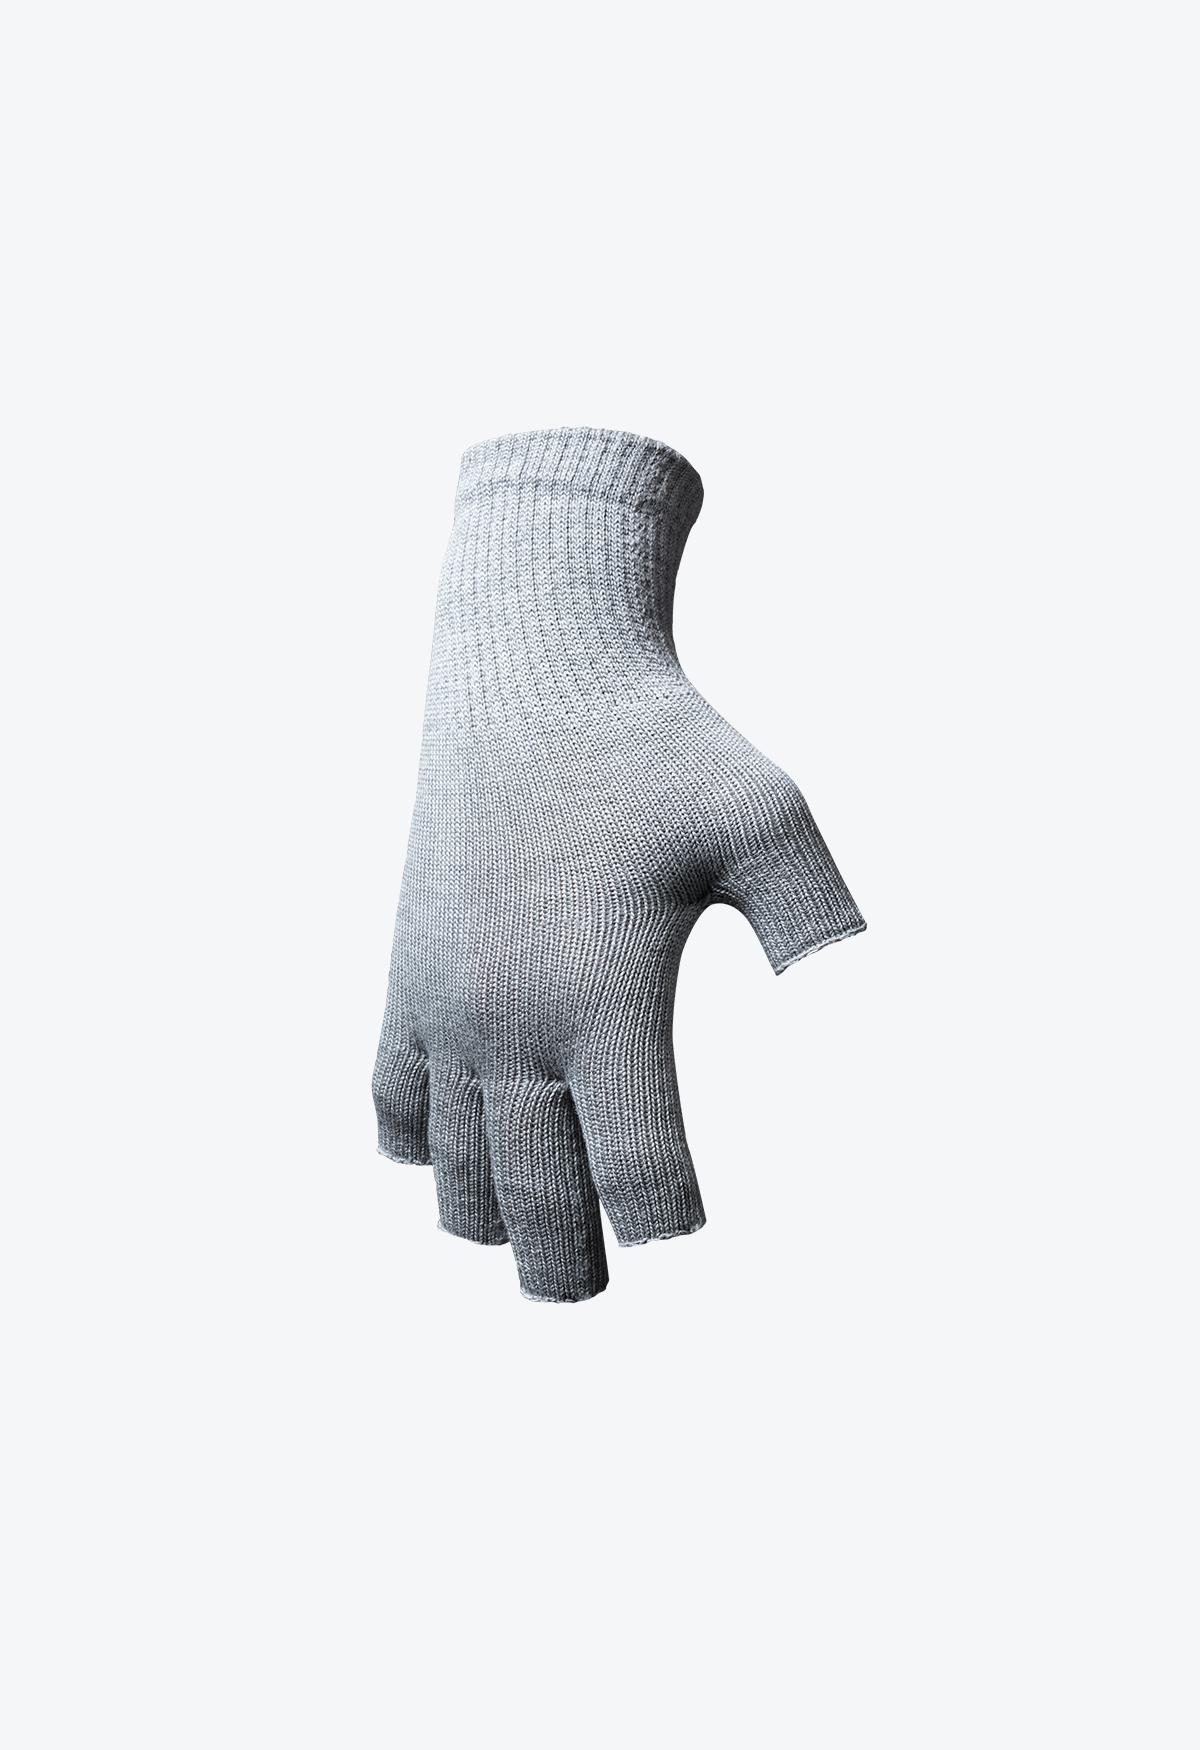 Circulation_Glove_Left